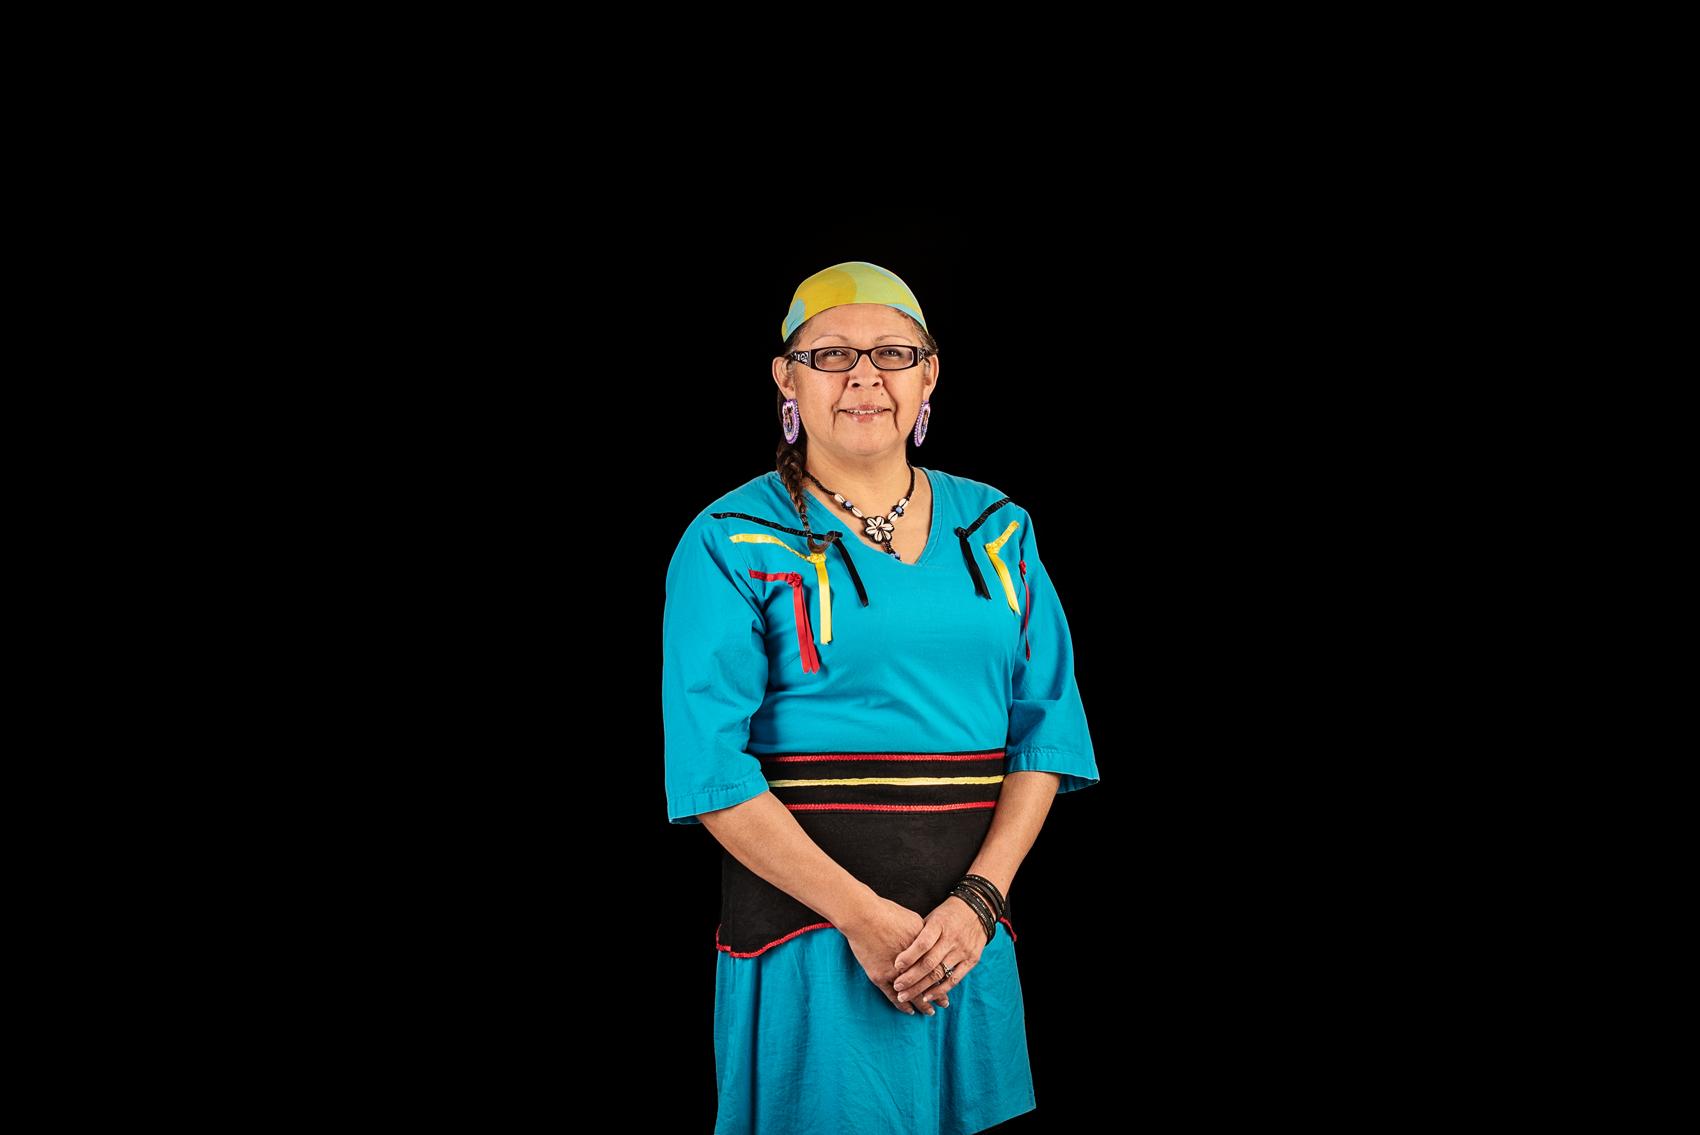 Margaret Kisikaw Piyesis, CEO of Regina's All Nations Hope Network. Photo by Carina Gartner, Details Photography Studio